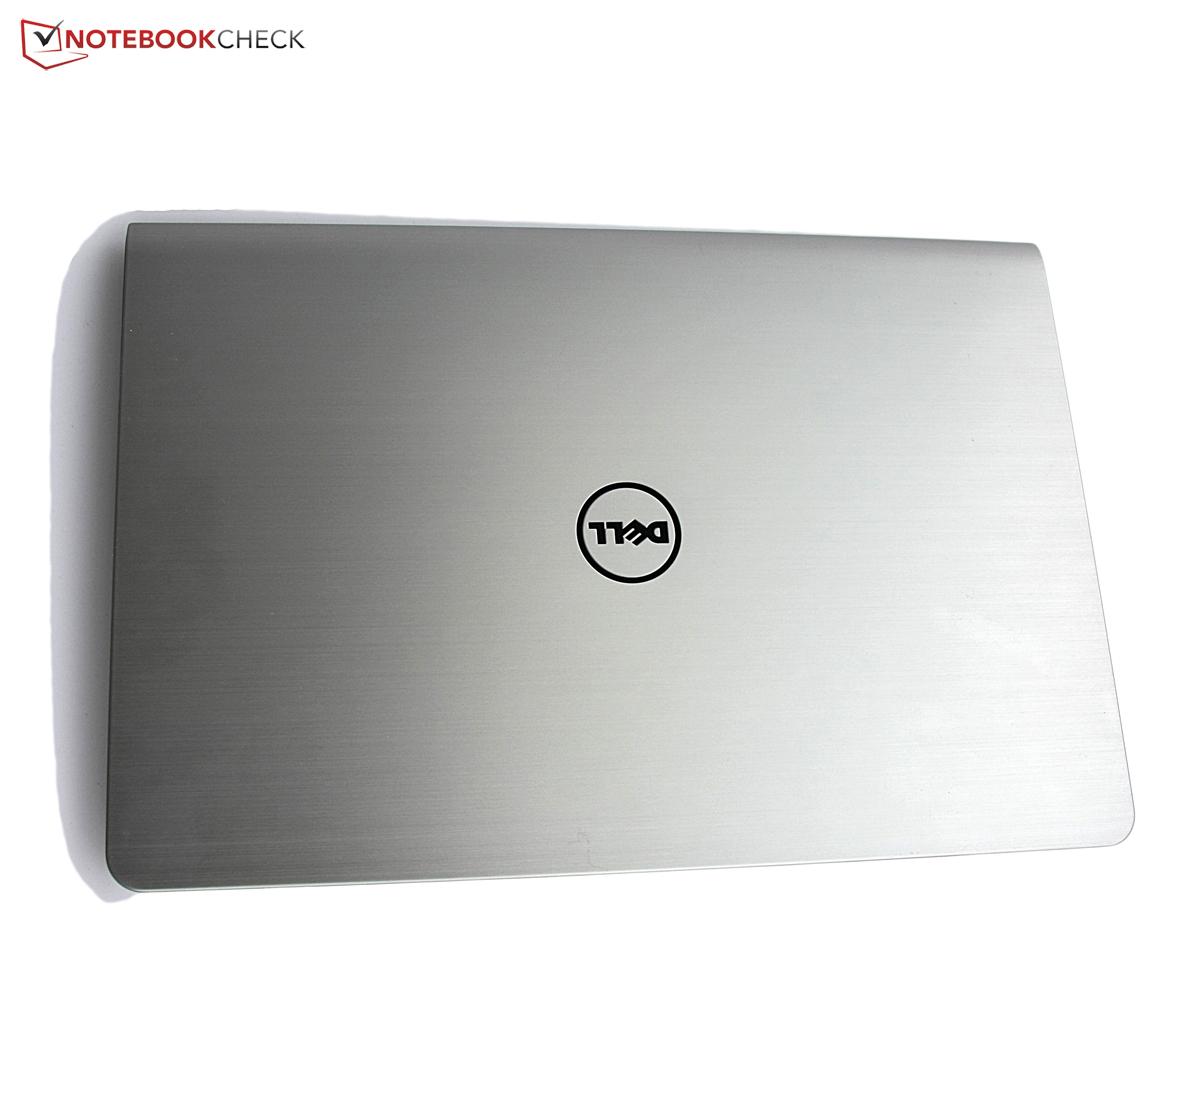 New Original Dell Inspiron 15 7000 7548 Spanish Espanol Backlit Keyboard Teclado